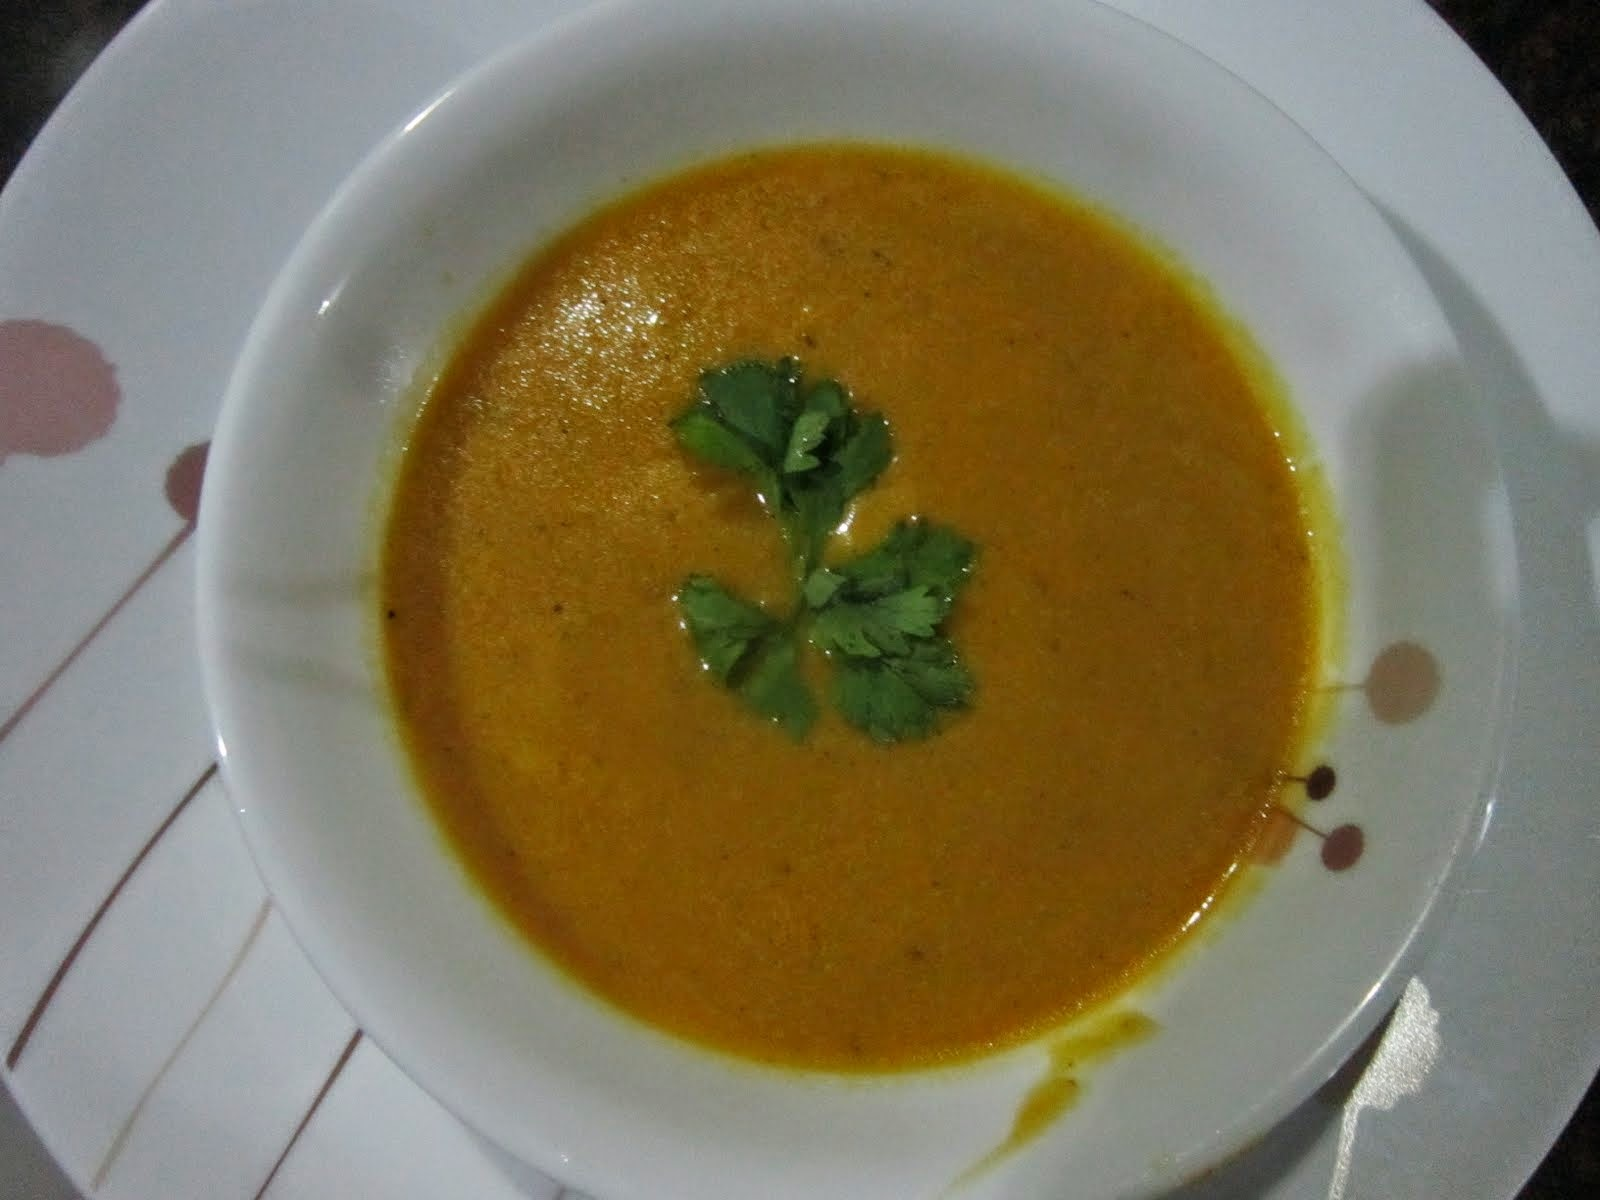 CREAMY COCO PUMPKIN SOUP - Using Alaska Crema